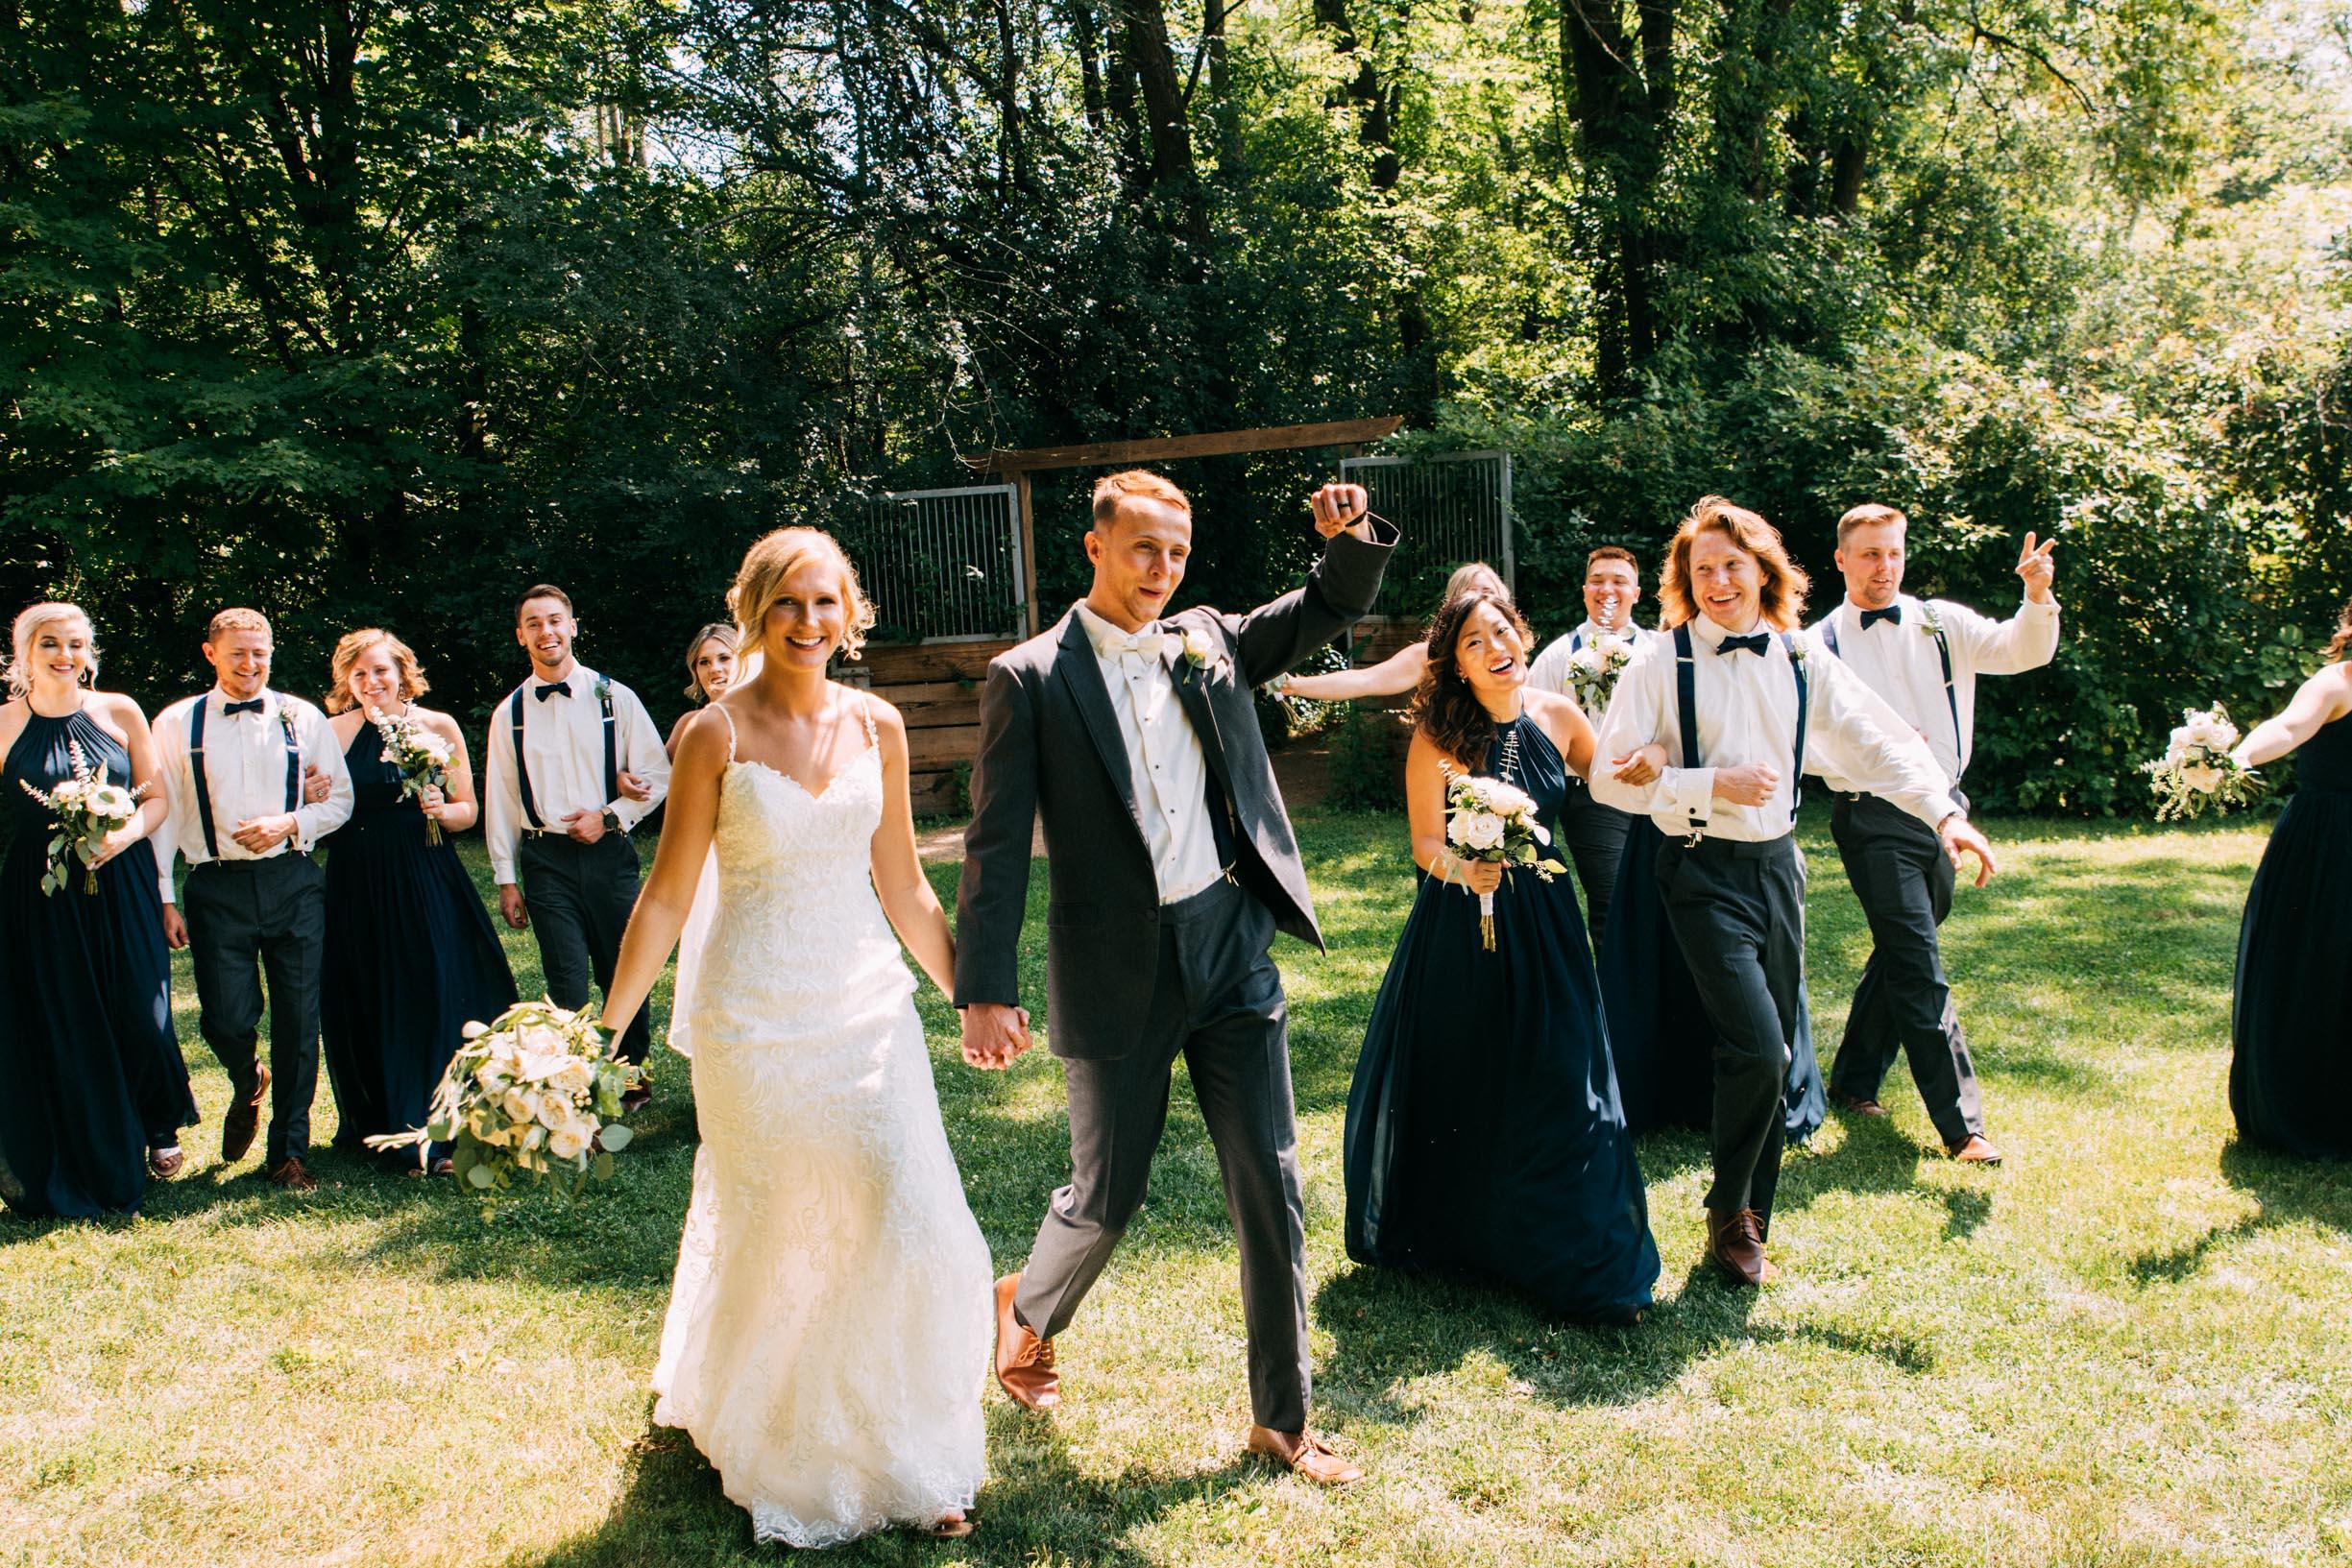 18-Minnetonka Orchards Wedding Ashley Bryce Blog.jpg